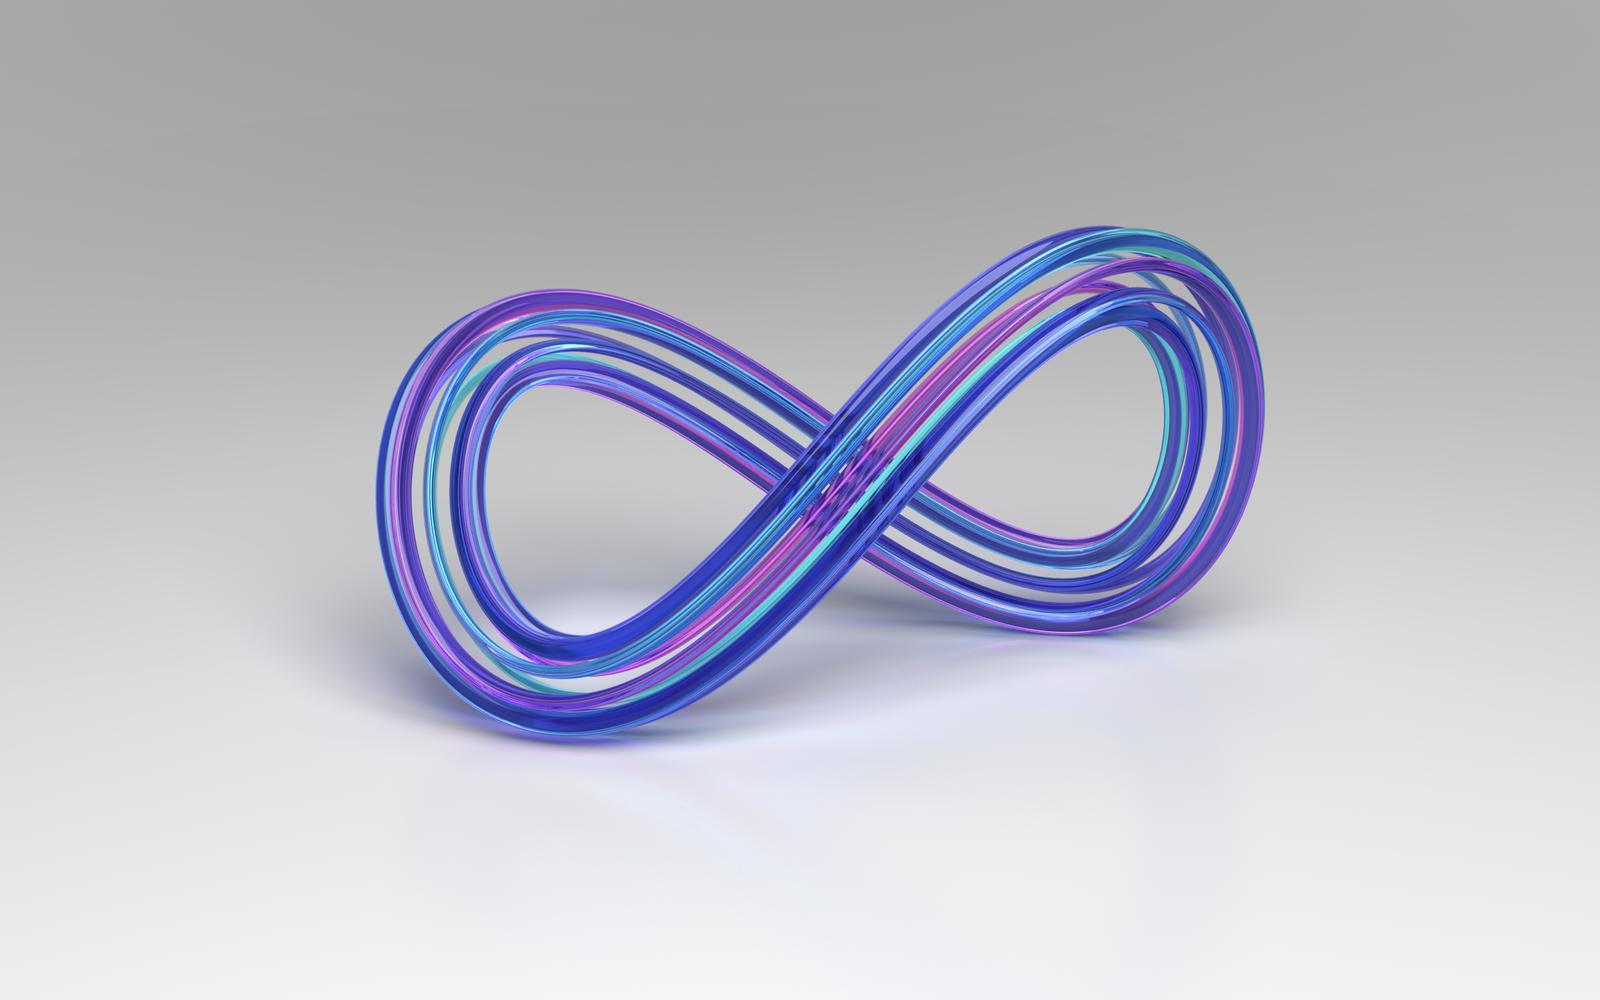 Infinite Twist [2560x1600] by MehranMo